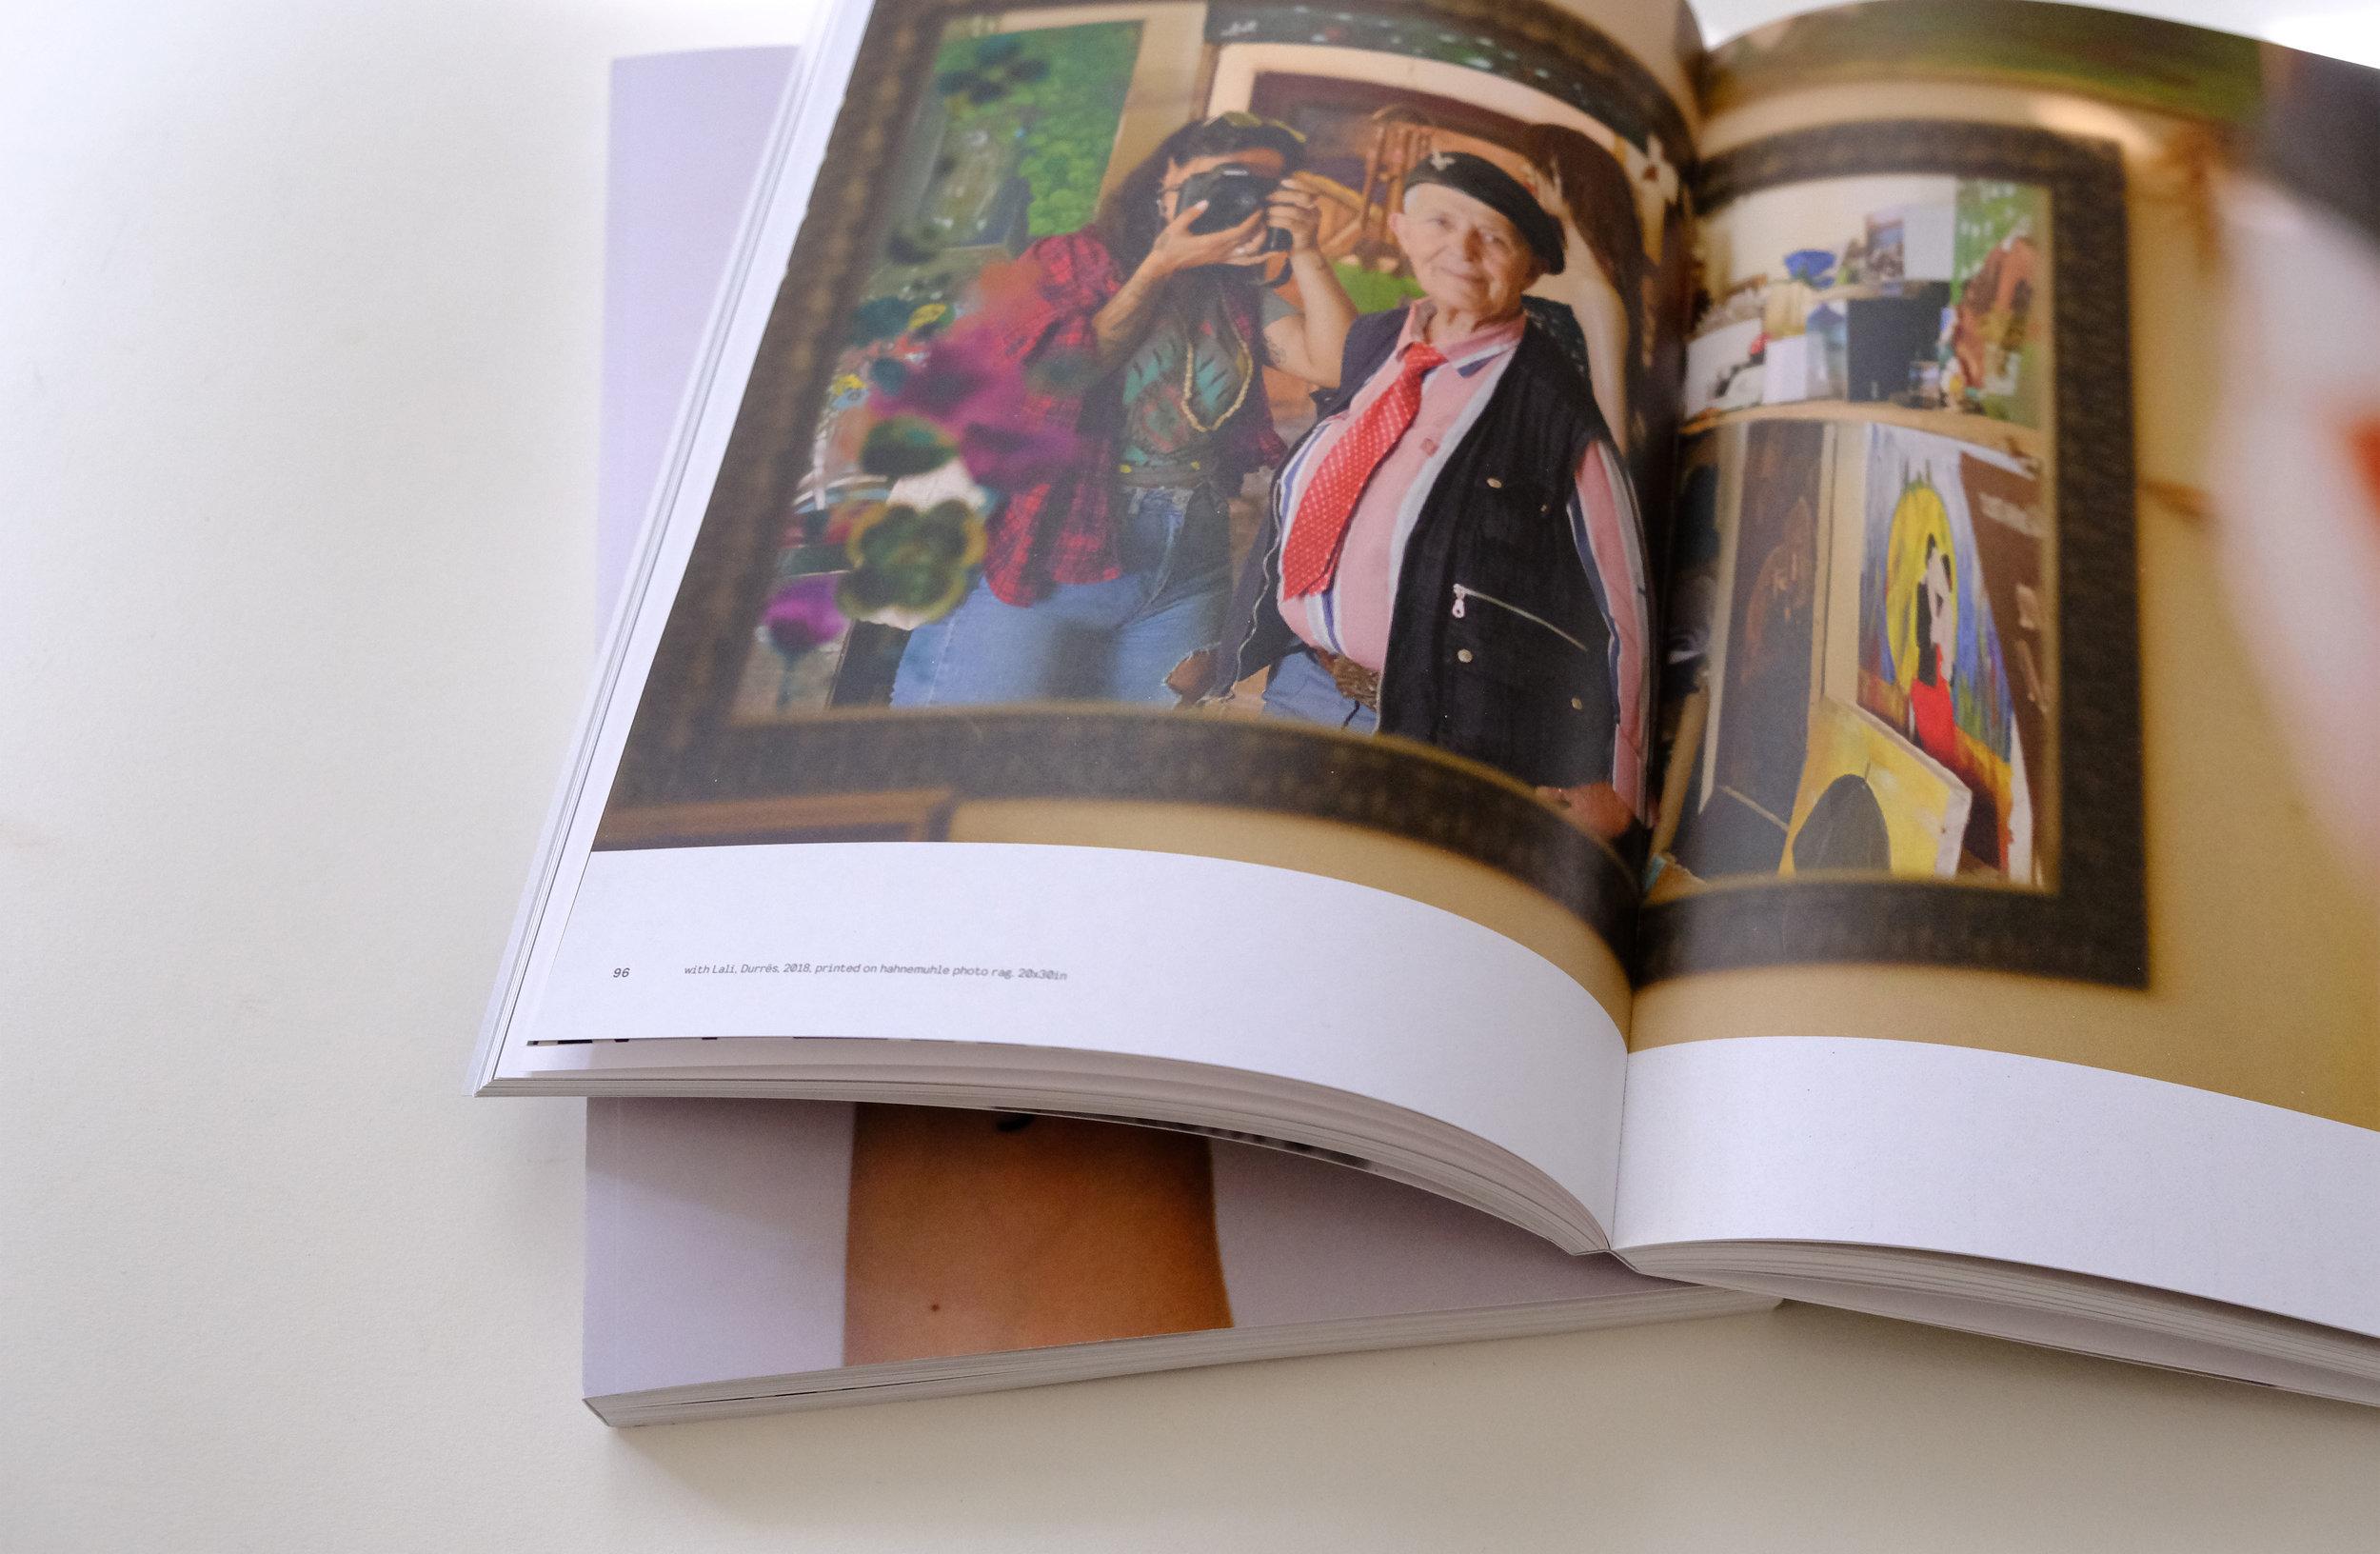 hamerika_book_shots_0014_DSCF0374.jpg